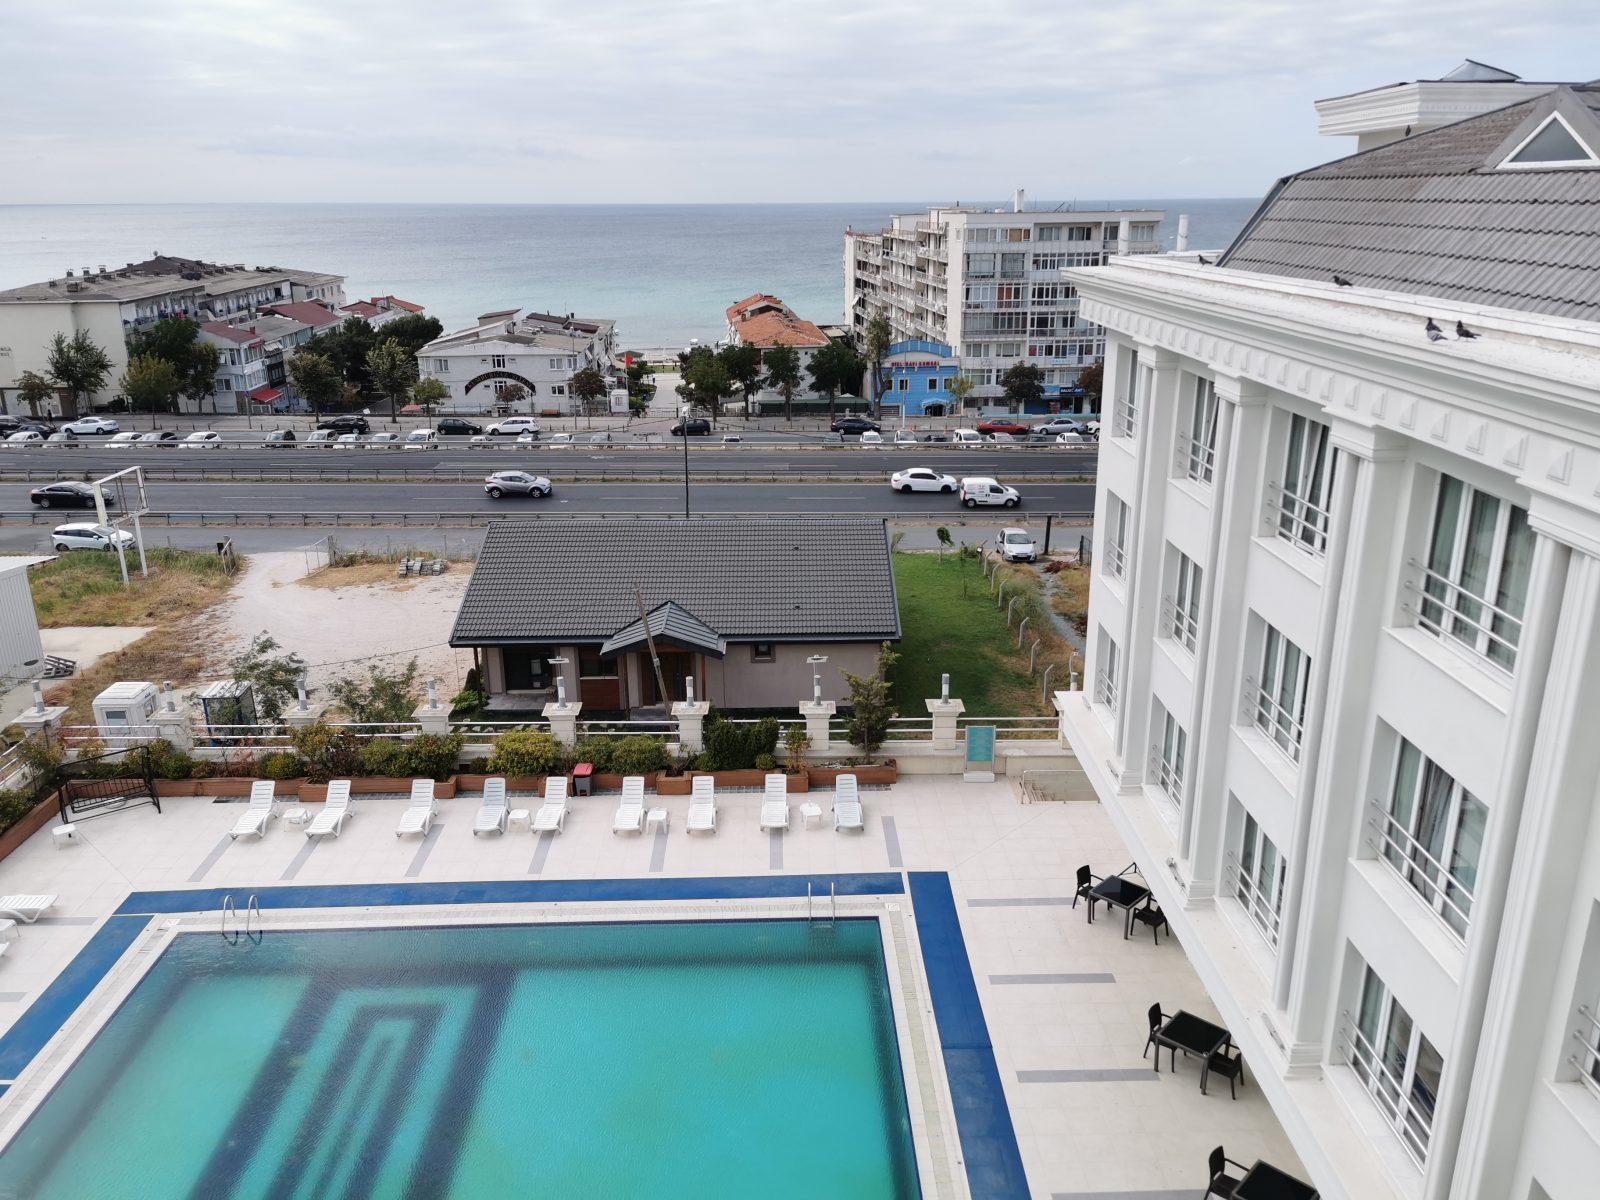 Letovanje Turska avionom, Kumburgaz, hotel Mercia, pogled na more iz hotela